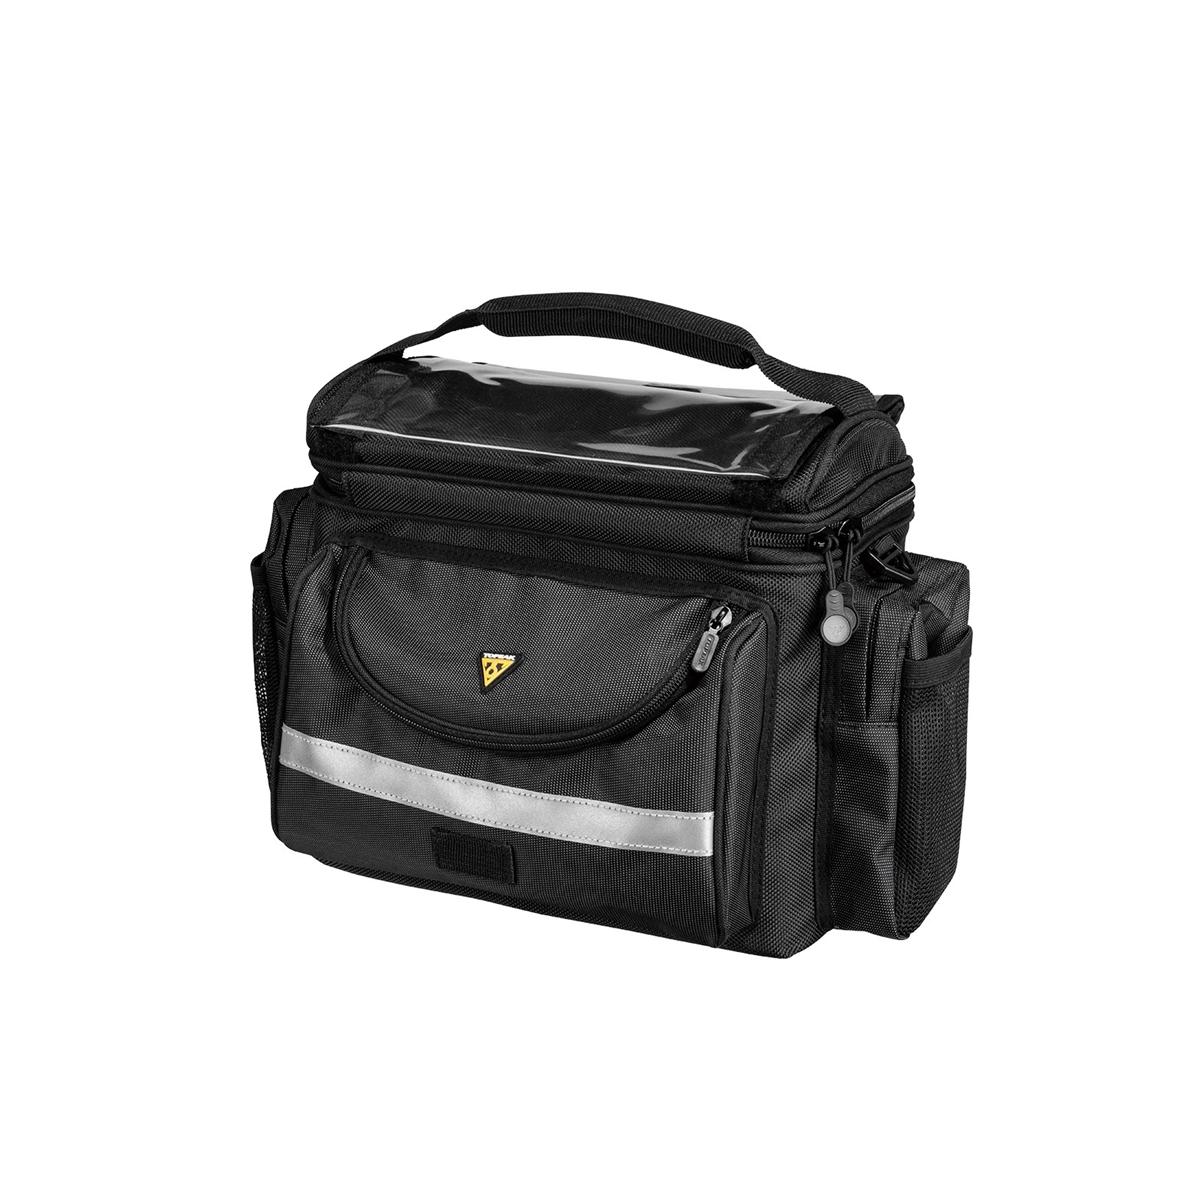 Borsa al Manubrio TourGuide Handlebar Bag DX 7,7L Attacco Fixer 8 QuickClick